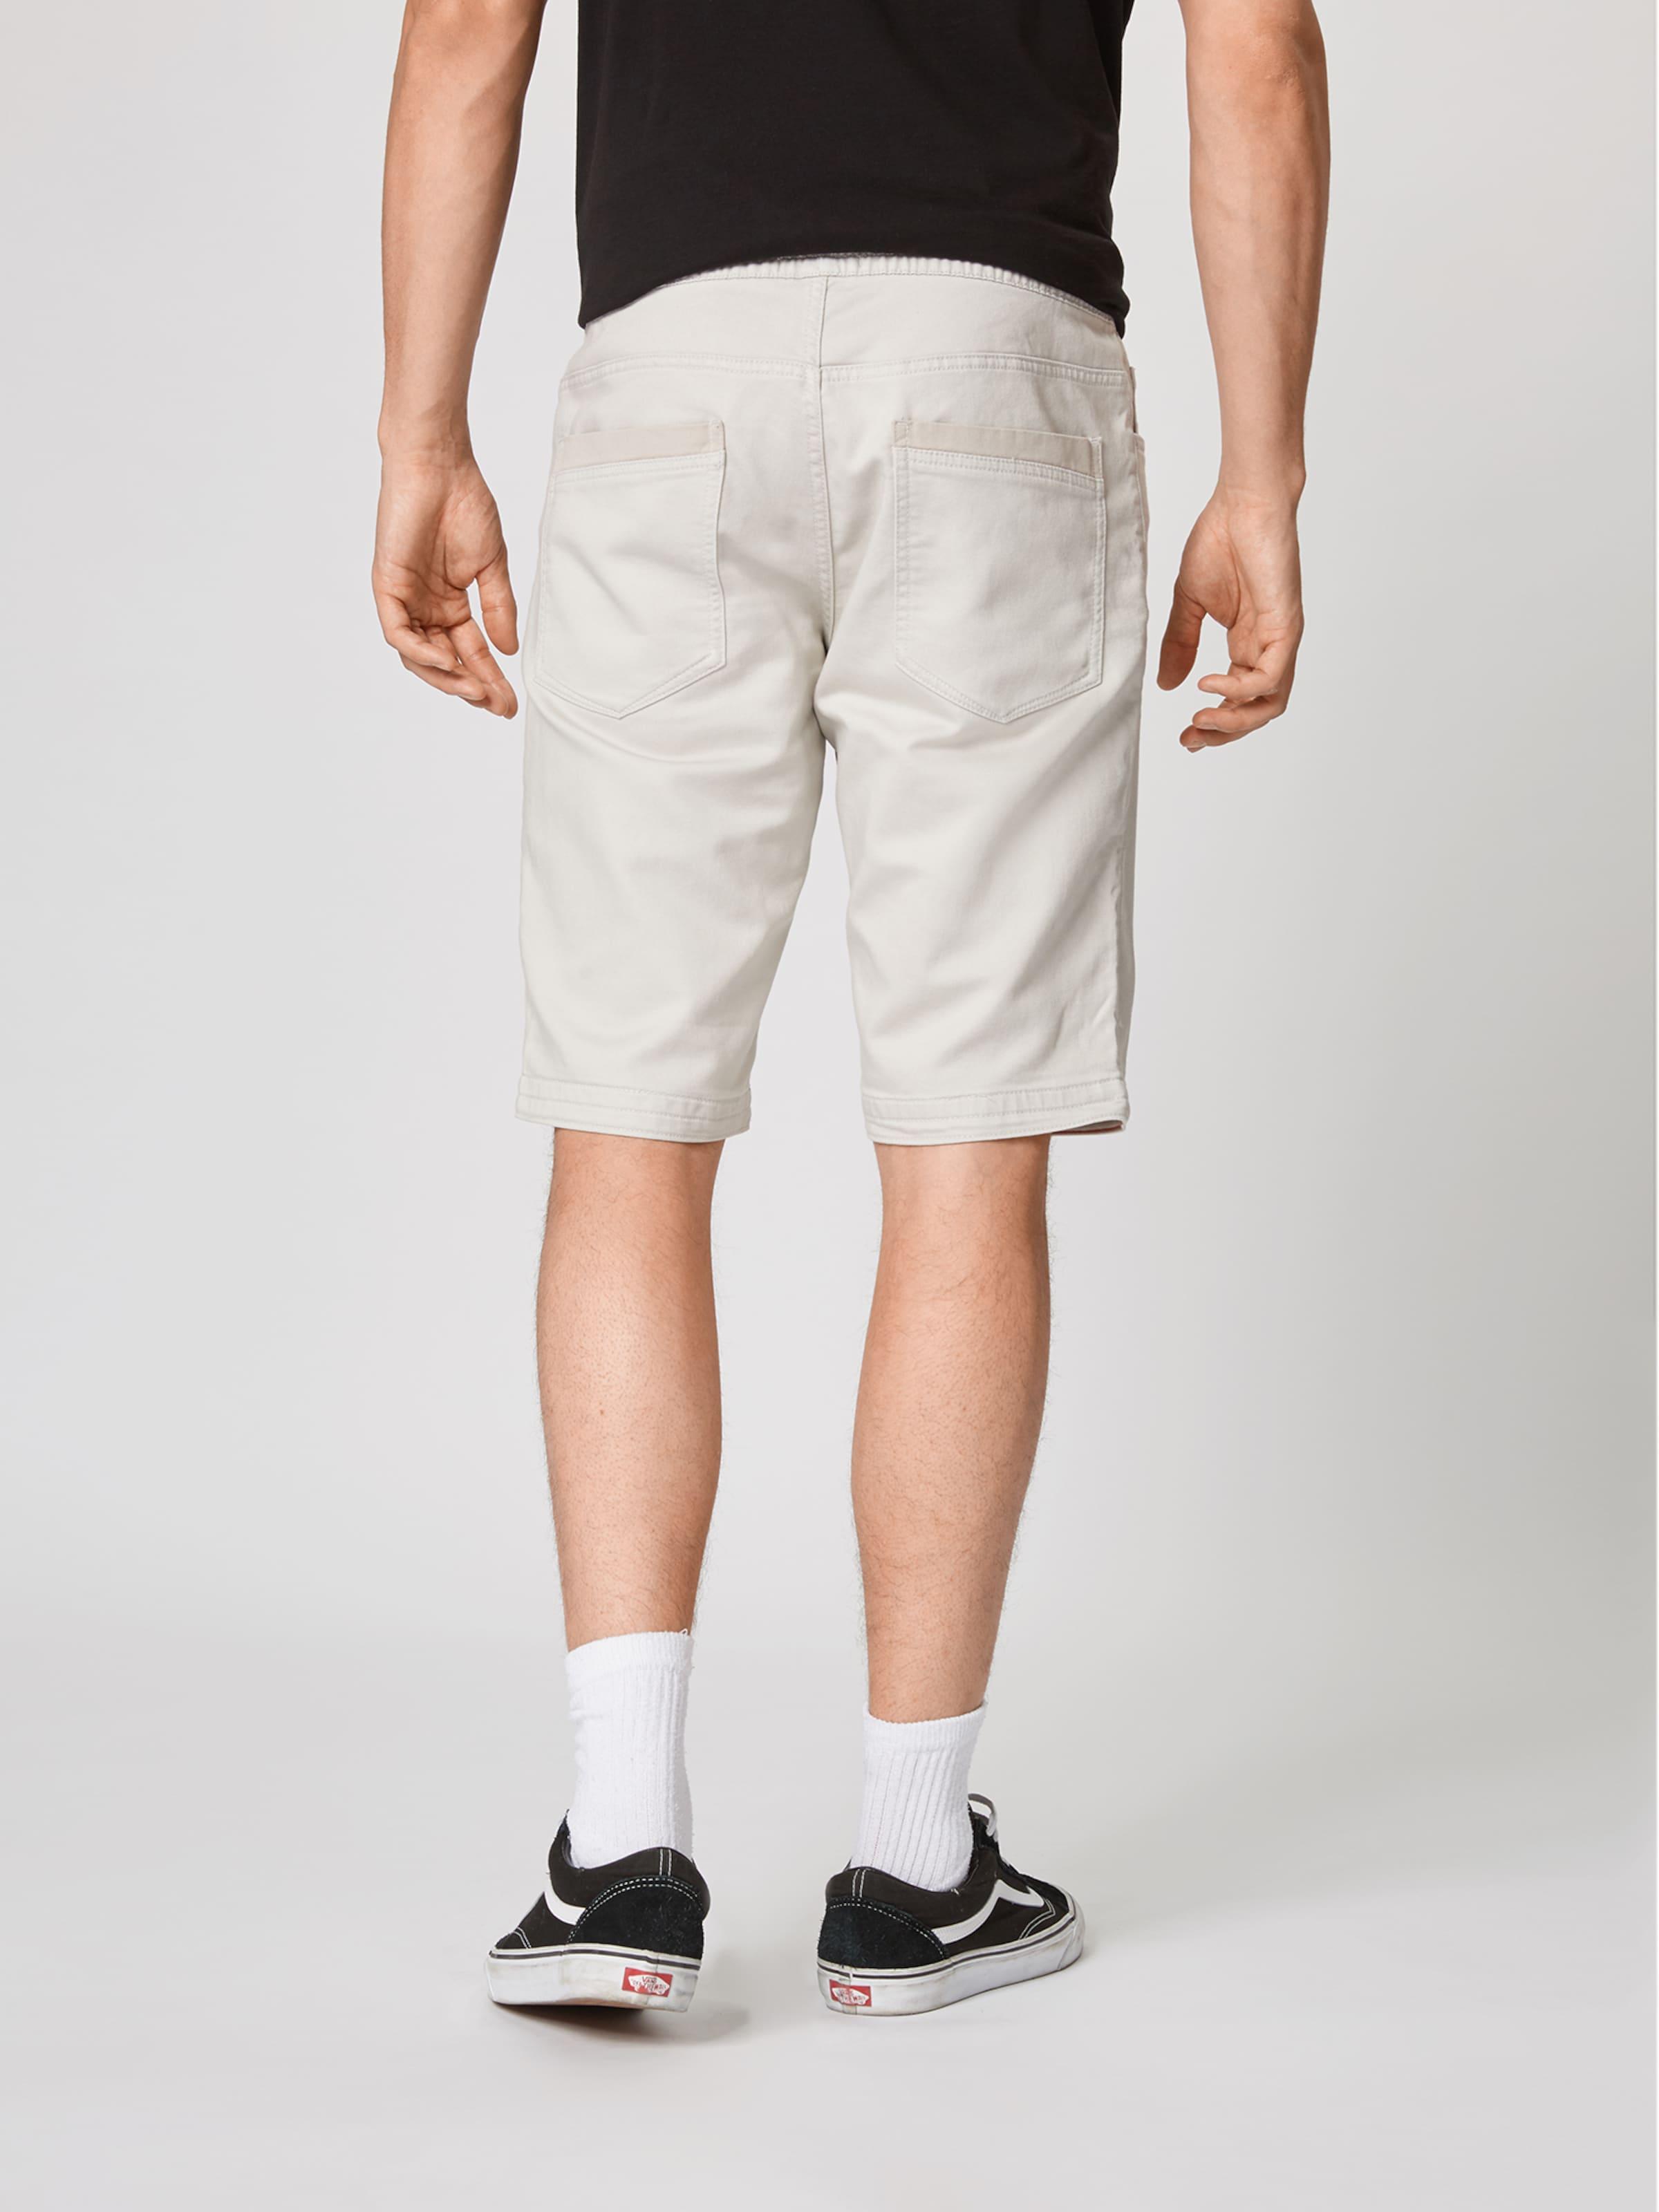 Tailor Pantalon Ivoire En Tom Tom Pantalon Tailor EHIW29DY